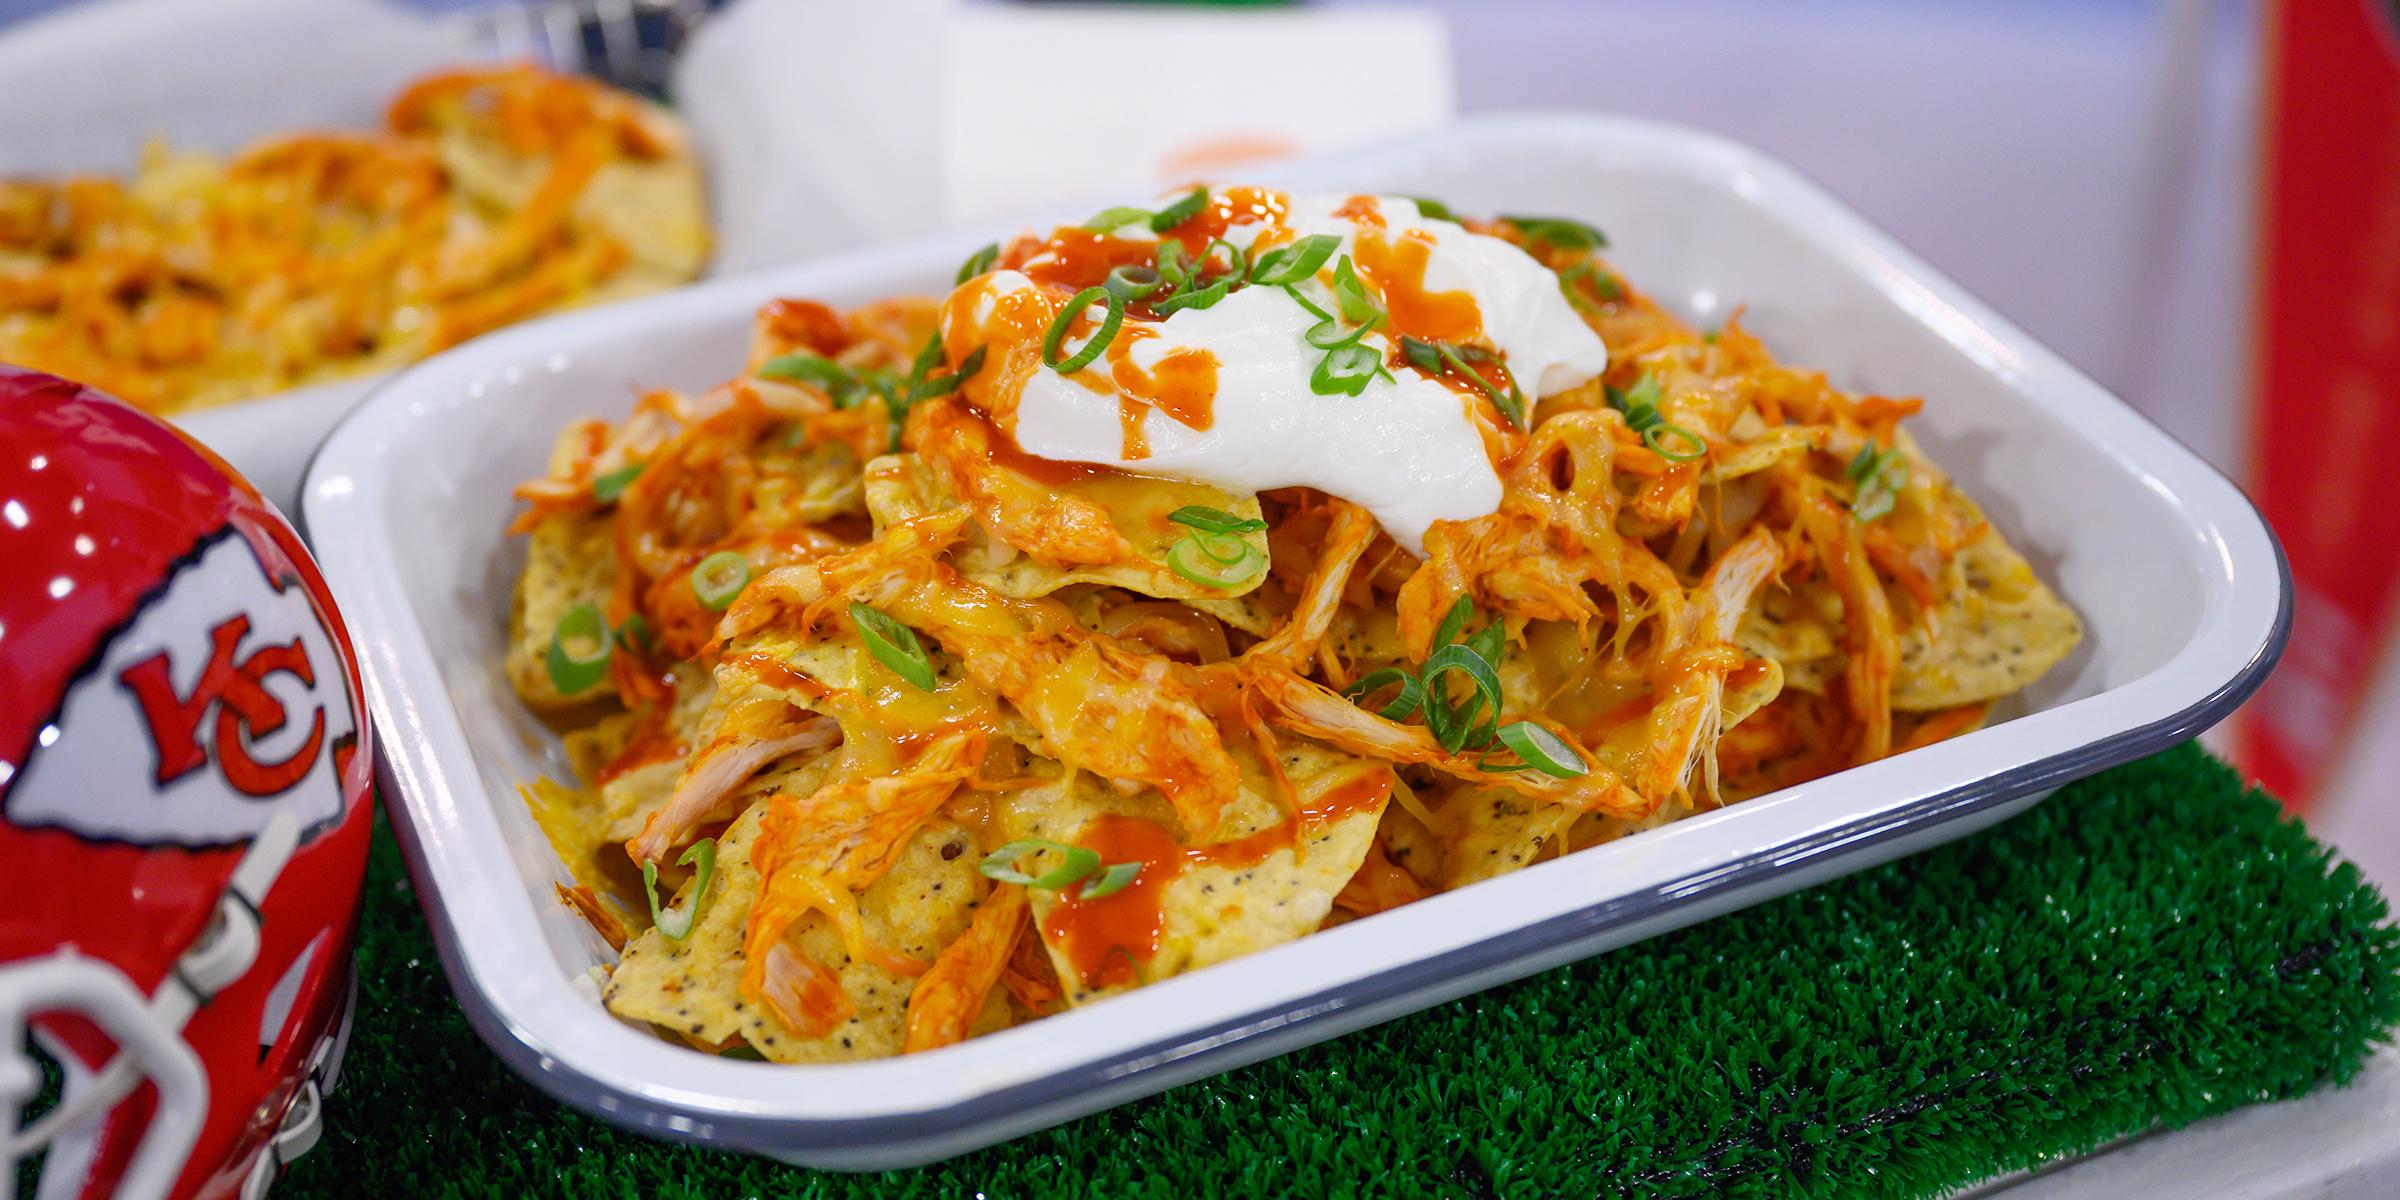 Healthier Super Bowl Recipes Pulled Pork Sliders Buffalo Chicken